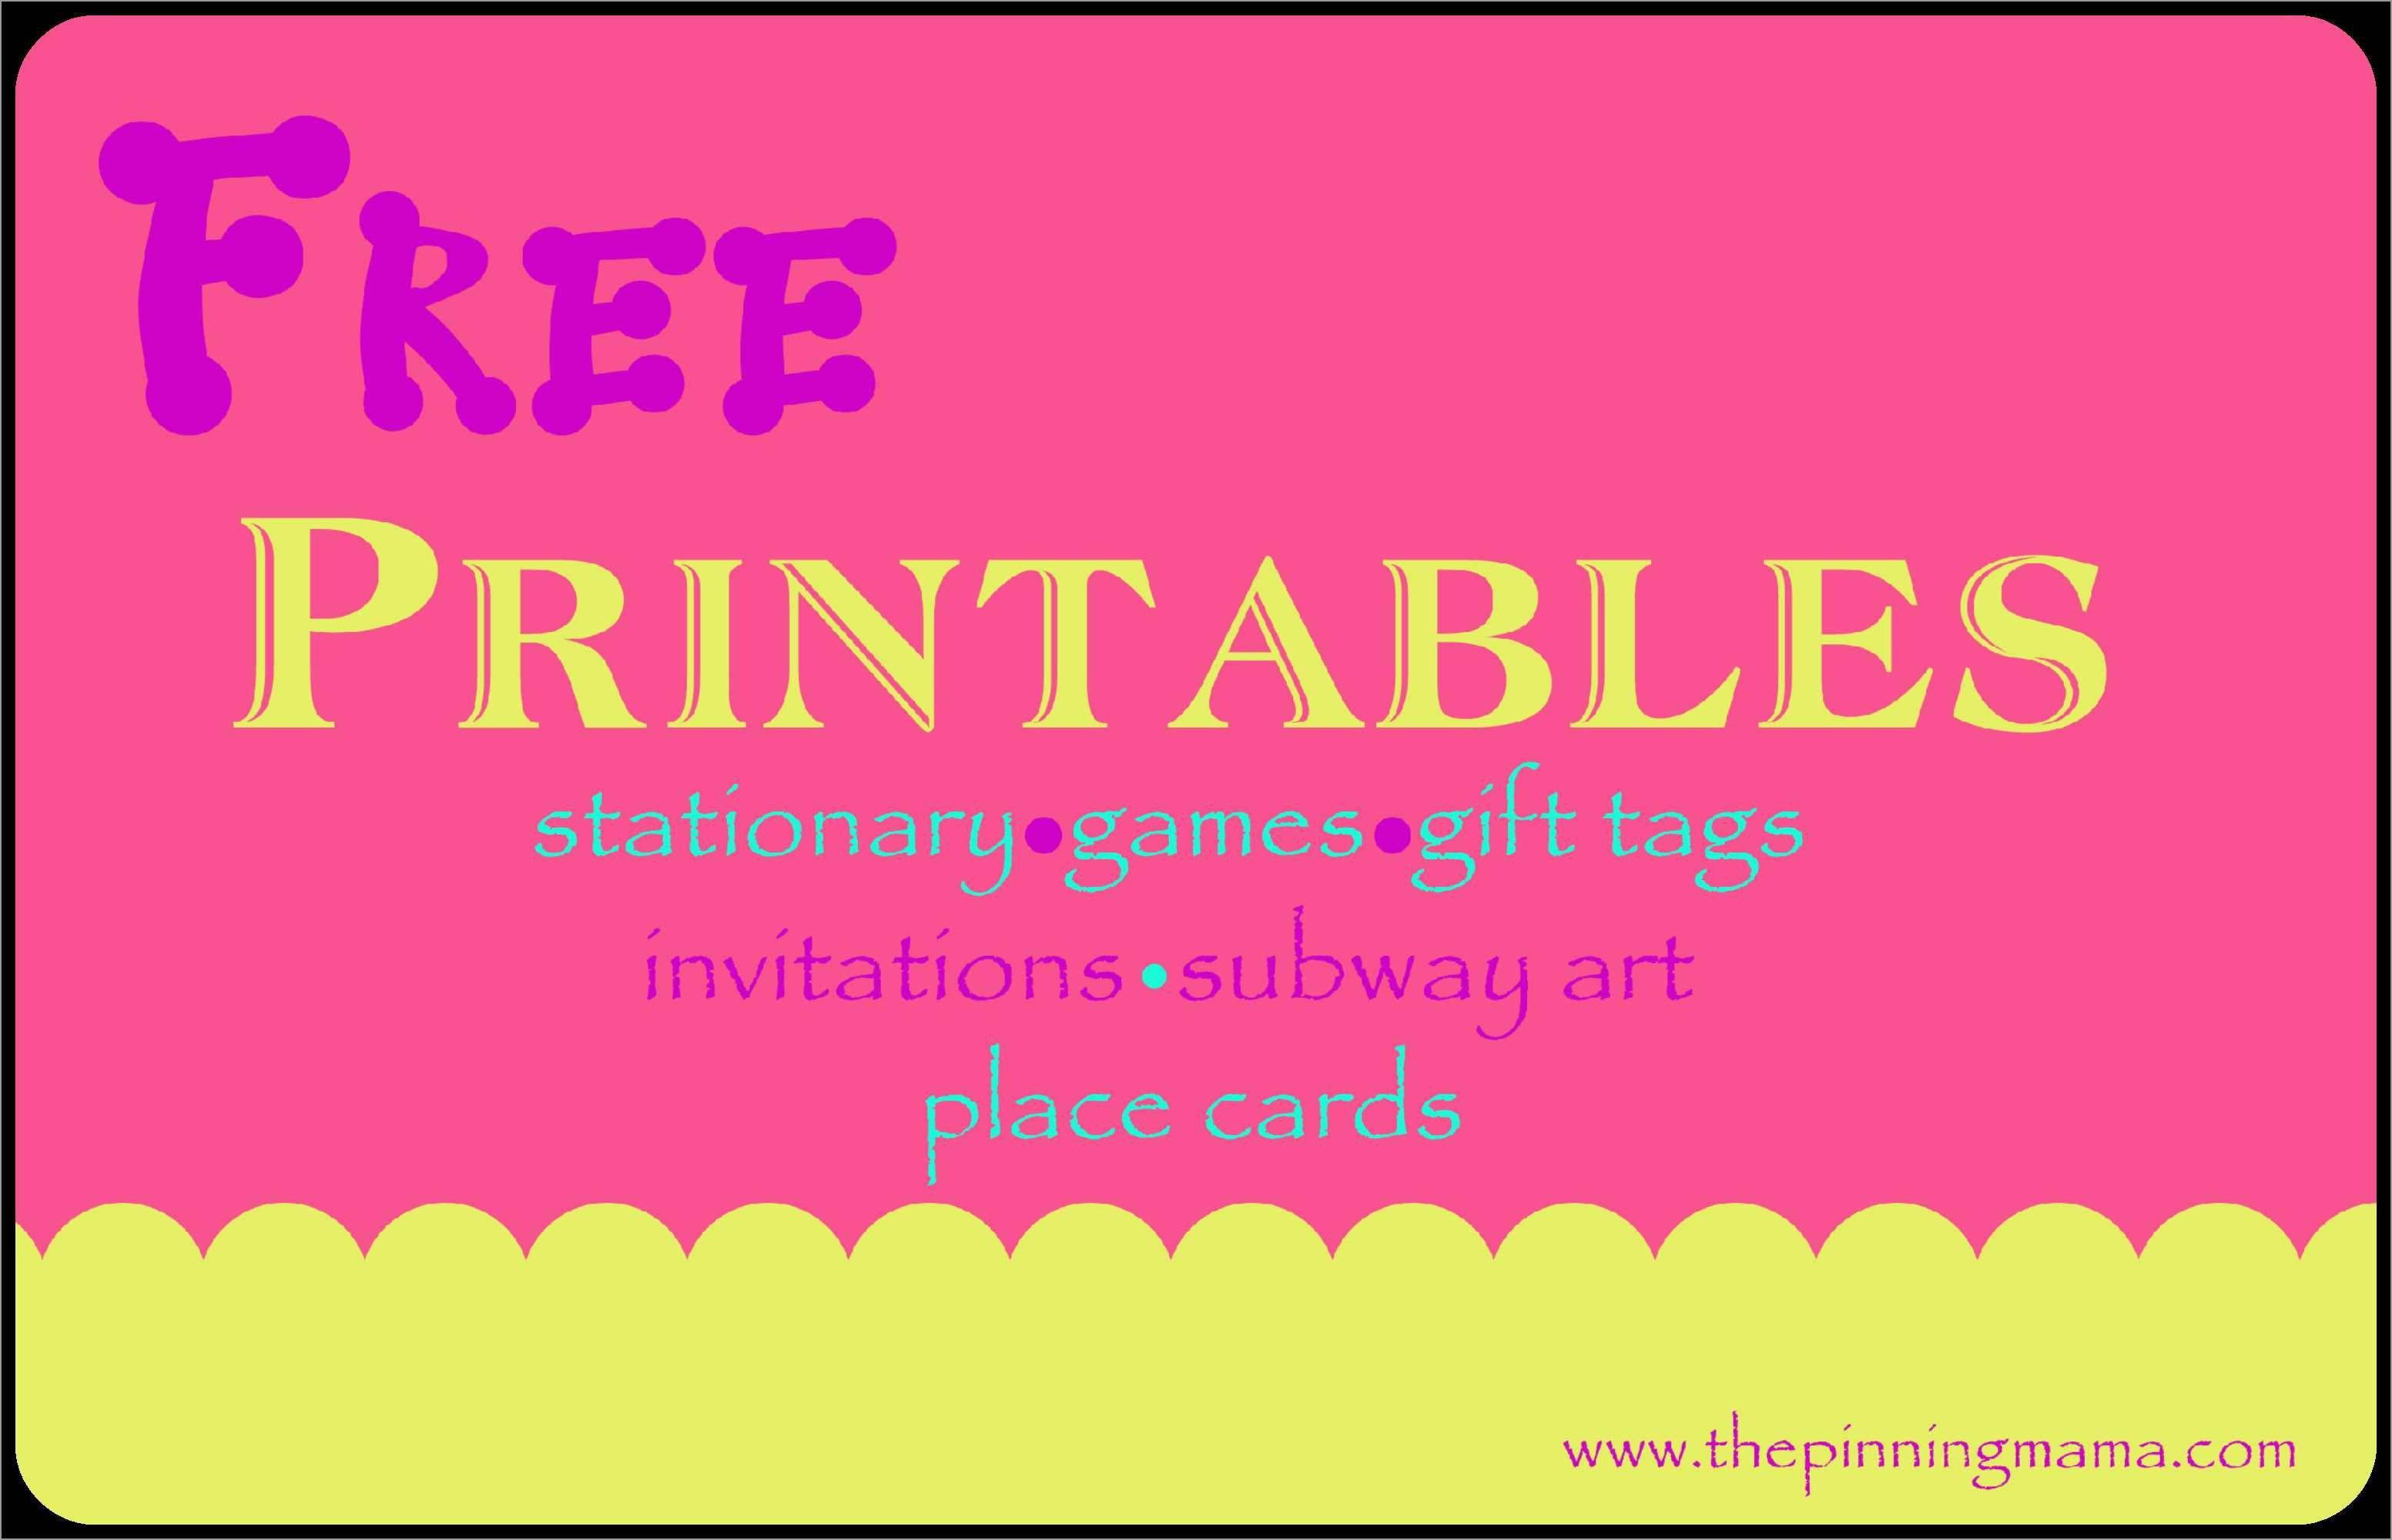 Elegant Free Online Baby Shower Invitations Templates | Best Of Template - Free Printable Baby Shower Invitation Maker